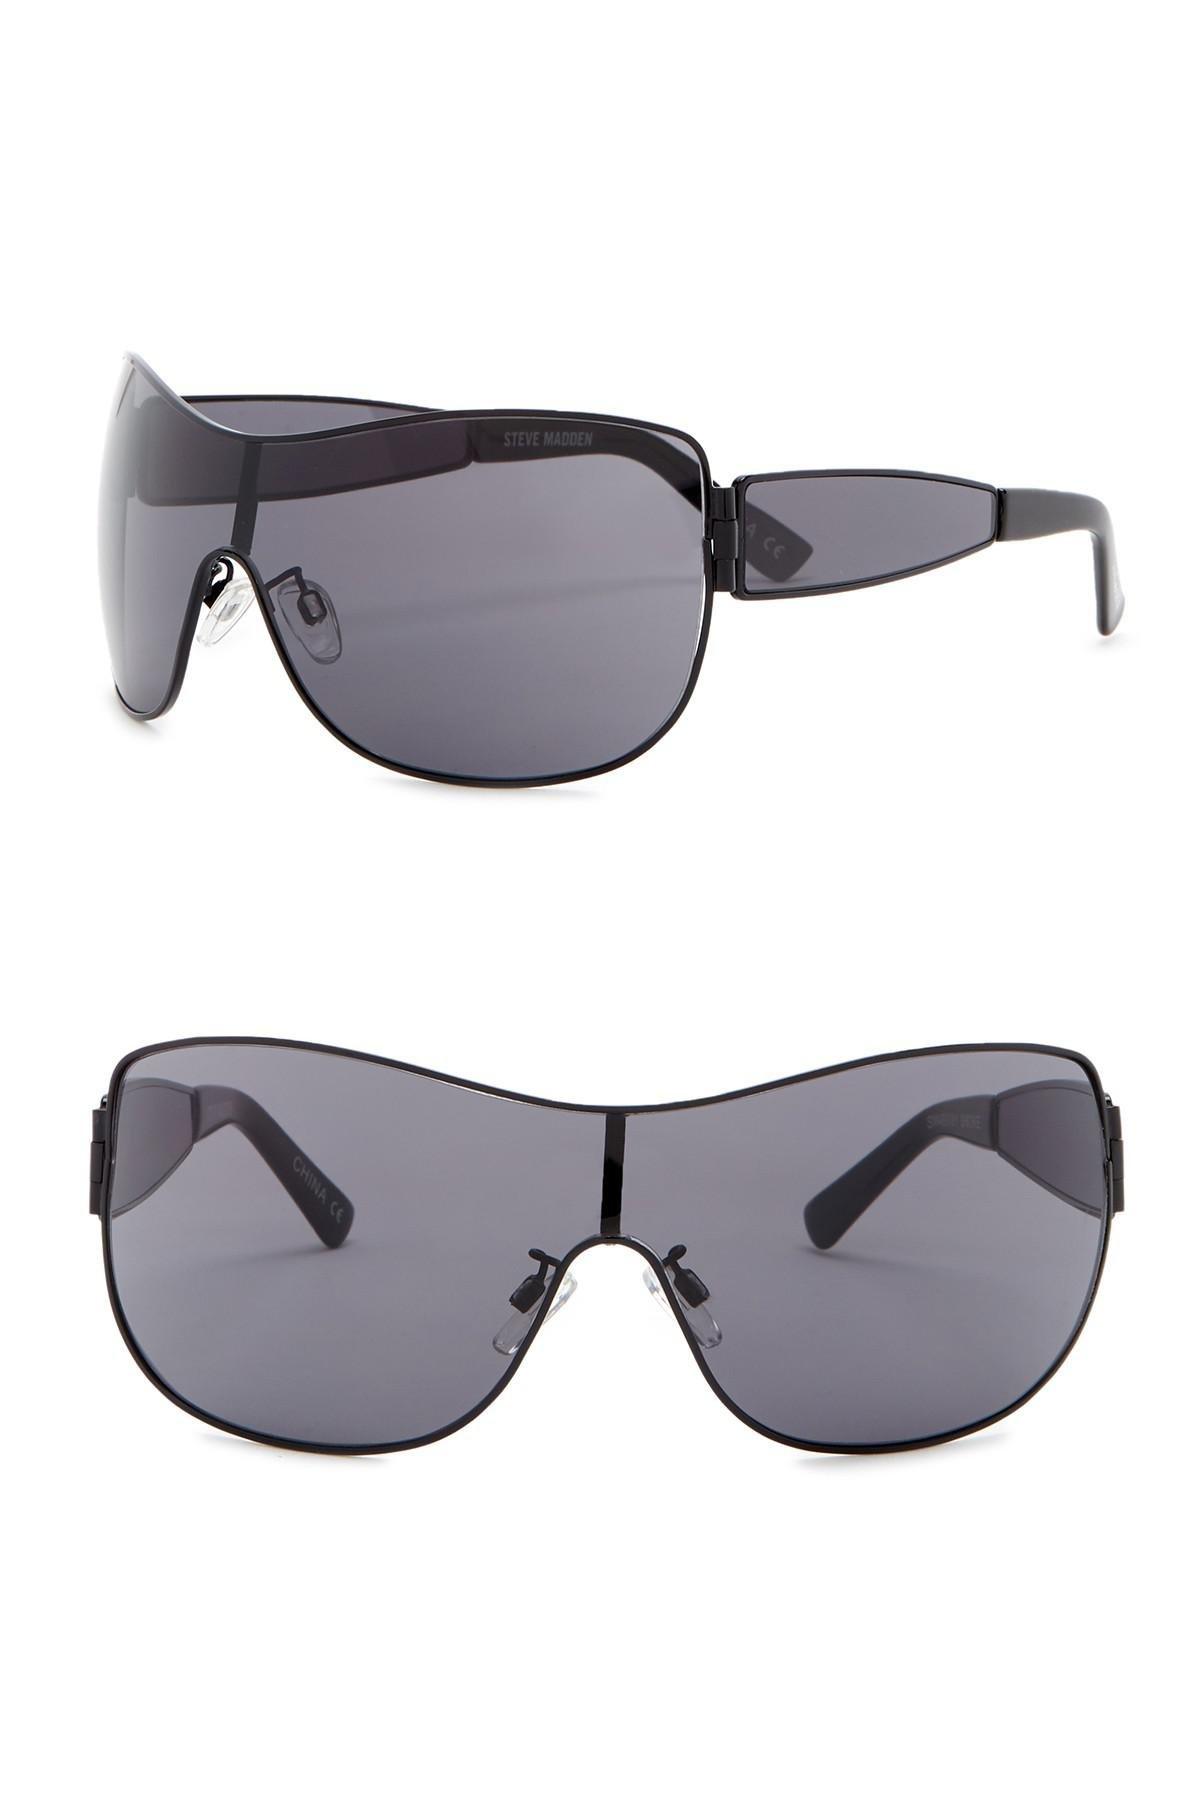 b99d5f70d54 Lyst - Steve Madden 135mm Shield Sunglasses in Gray